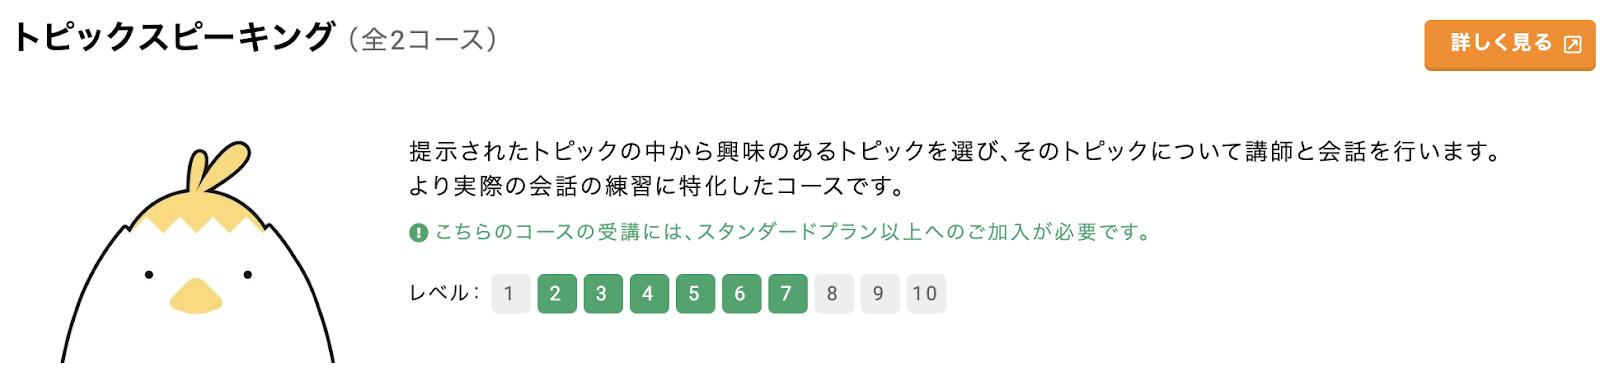 Kimini英会話 トピックスピーキング